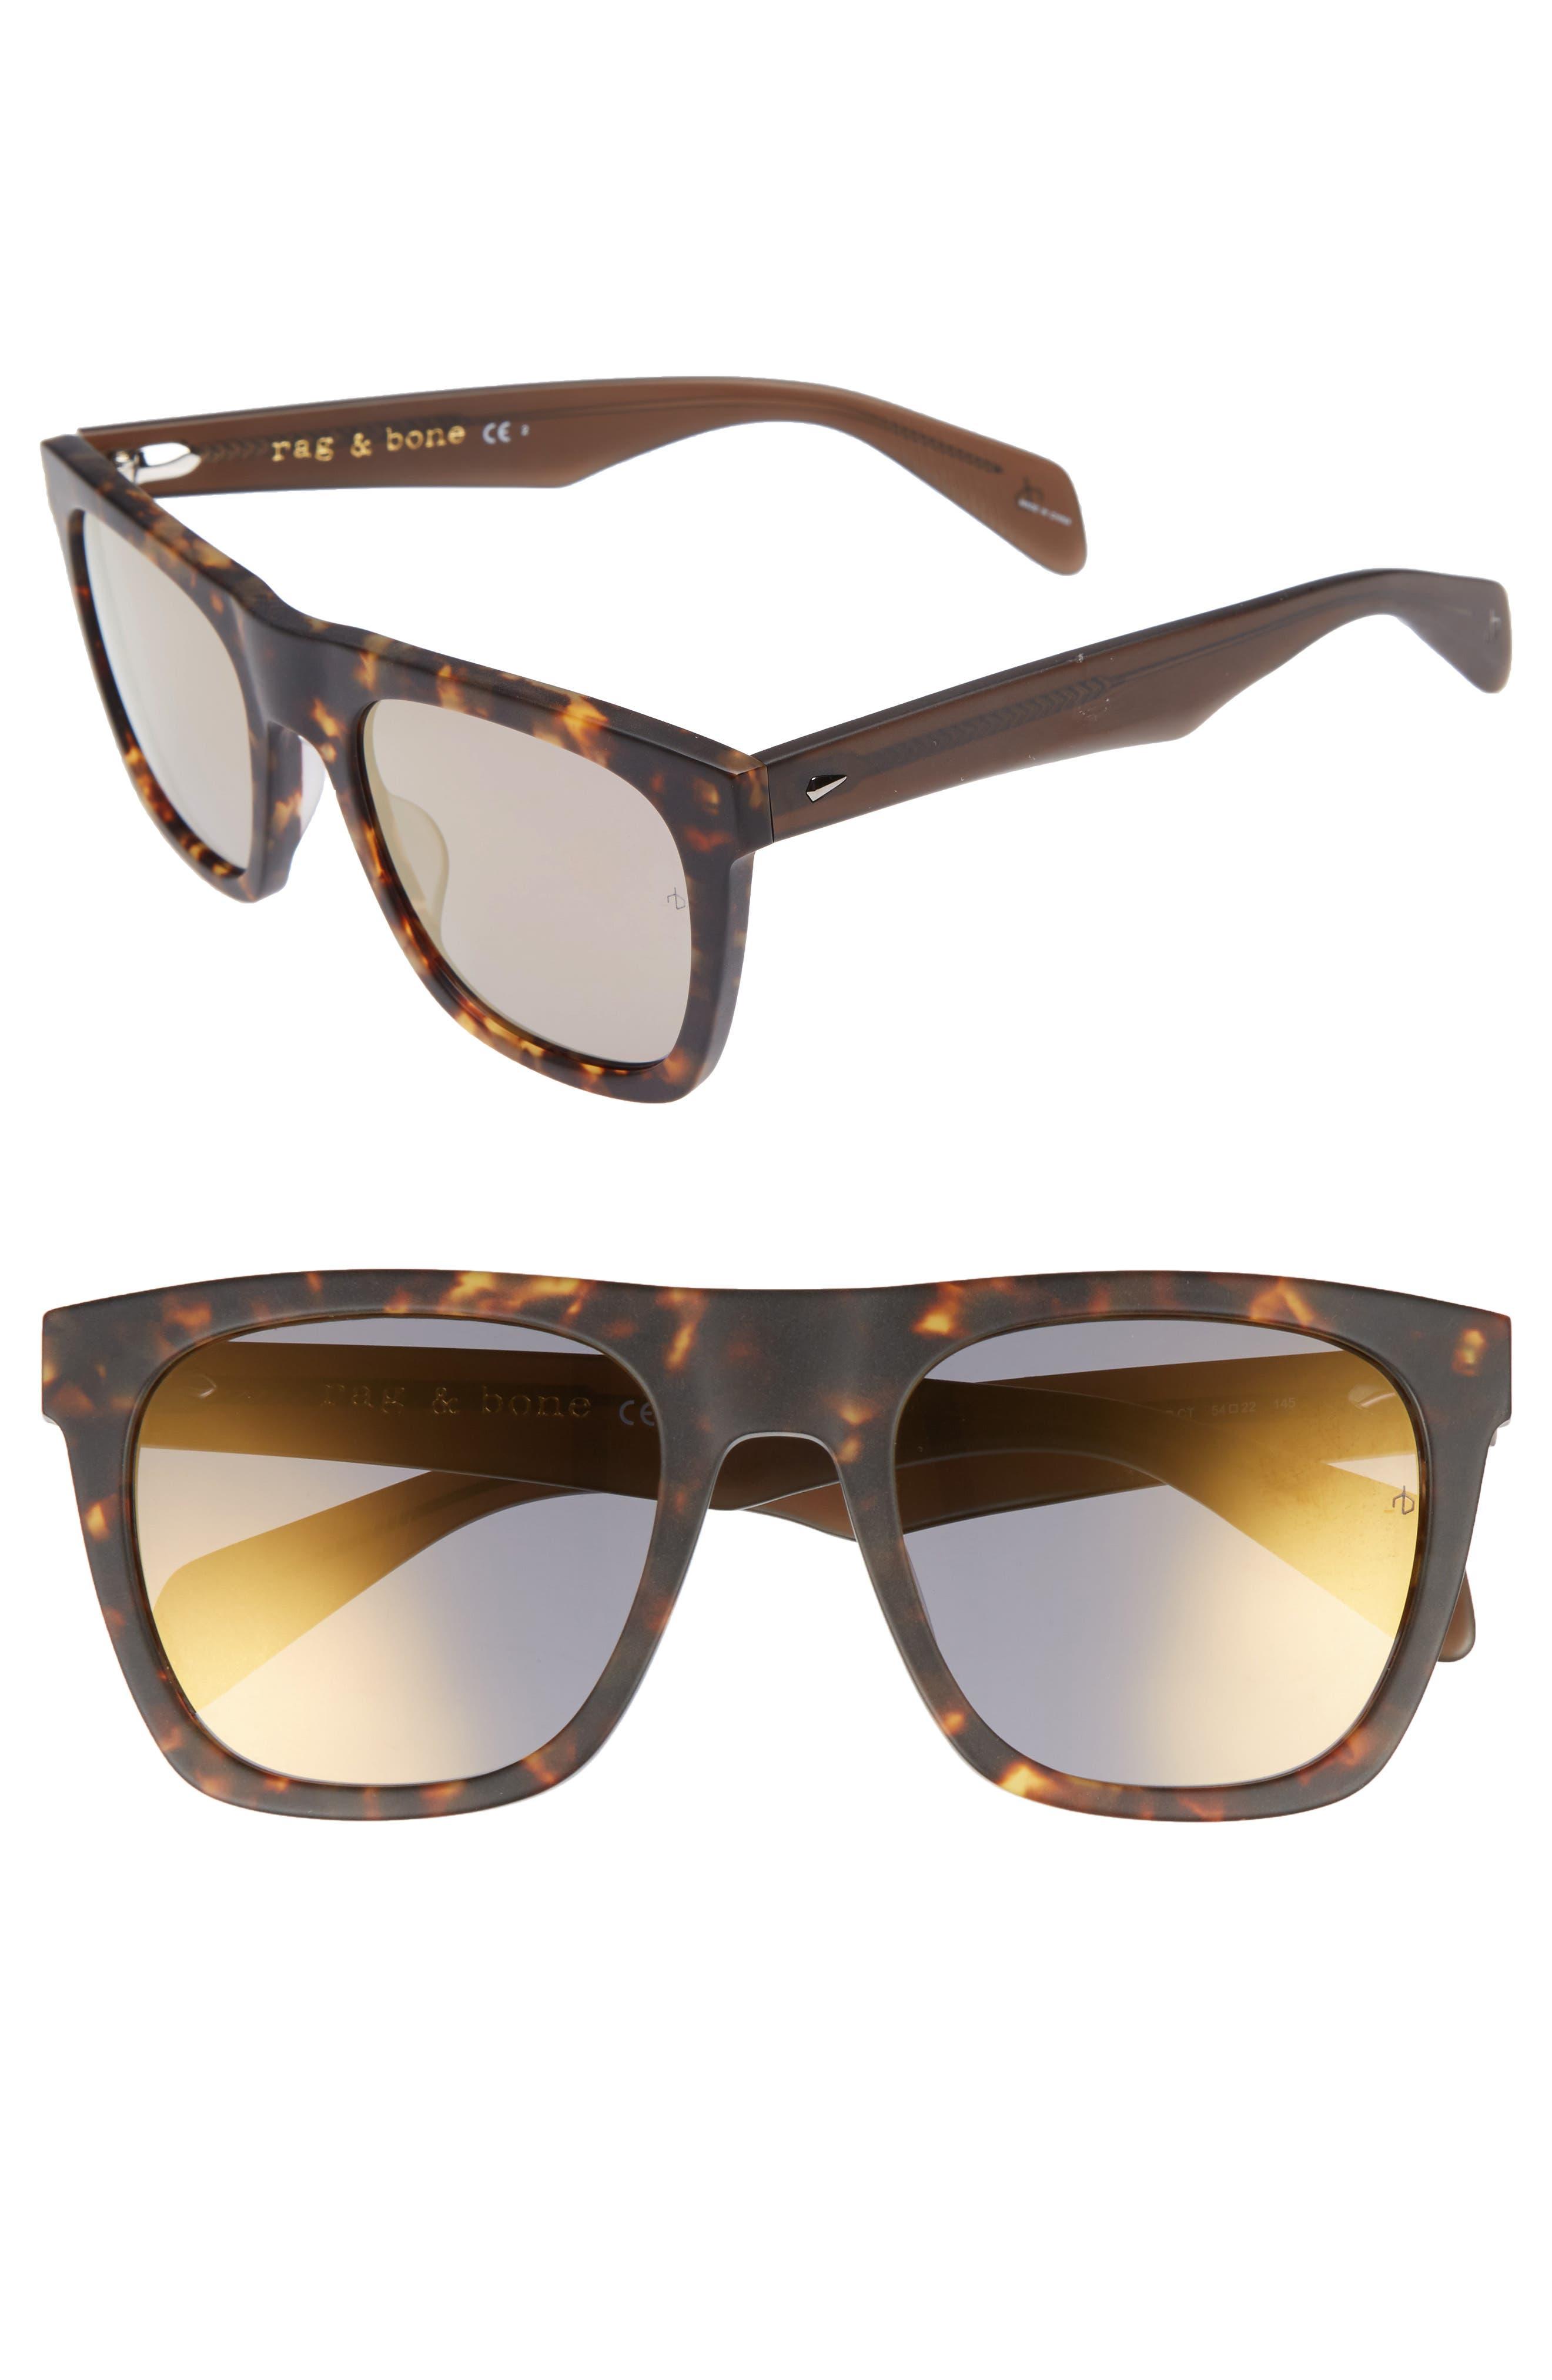 54mm Sunglasses,                         Main,                         color, 210